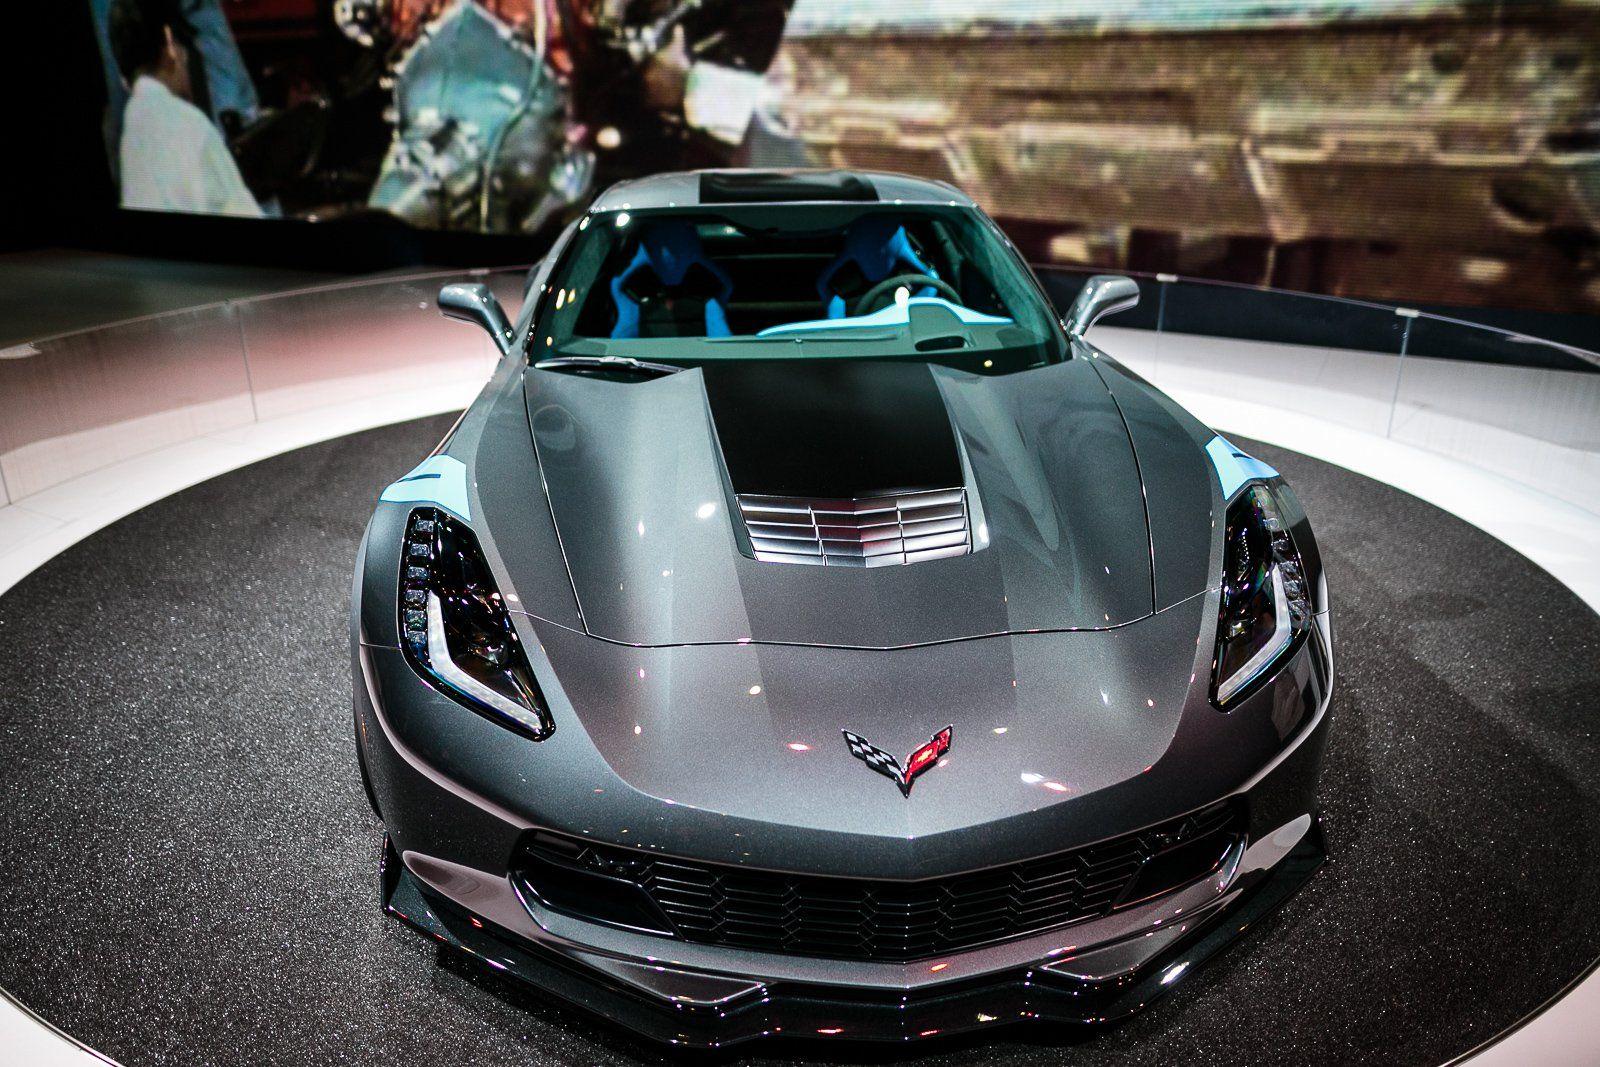 Inspirational Chevy Corvette 2017